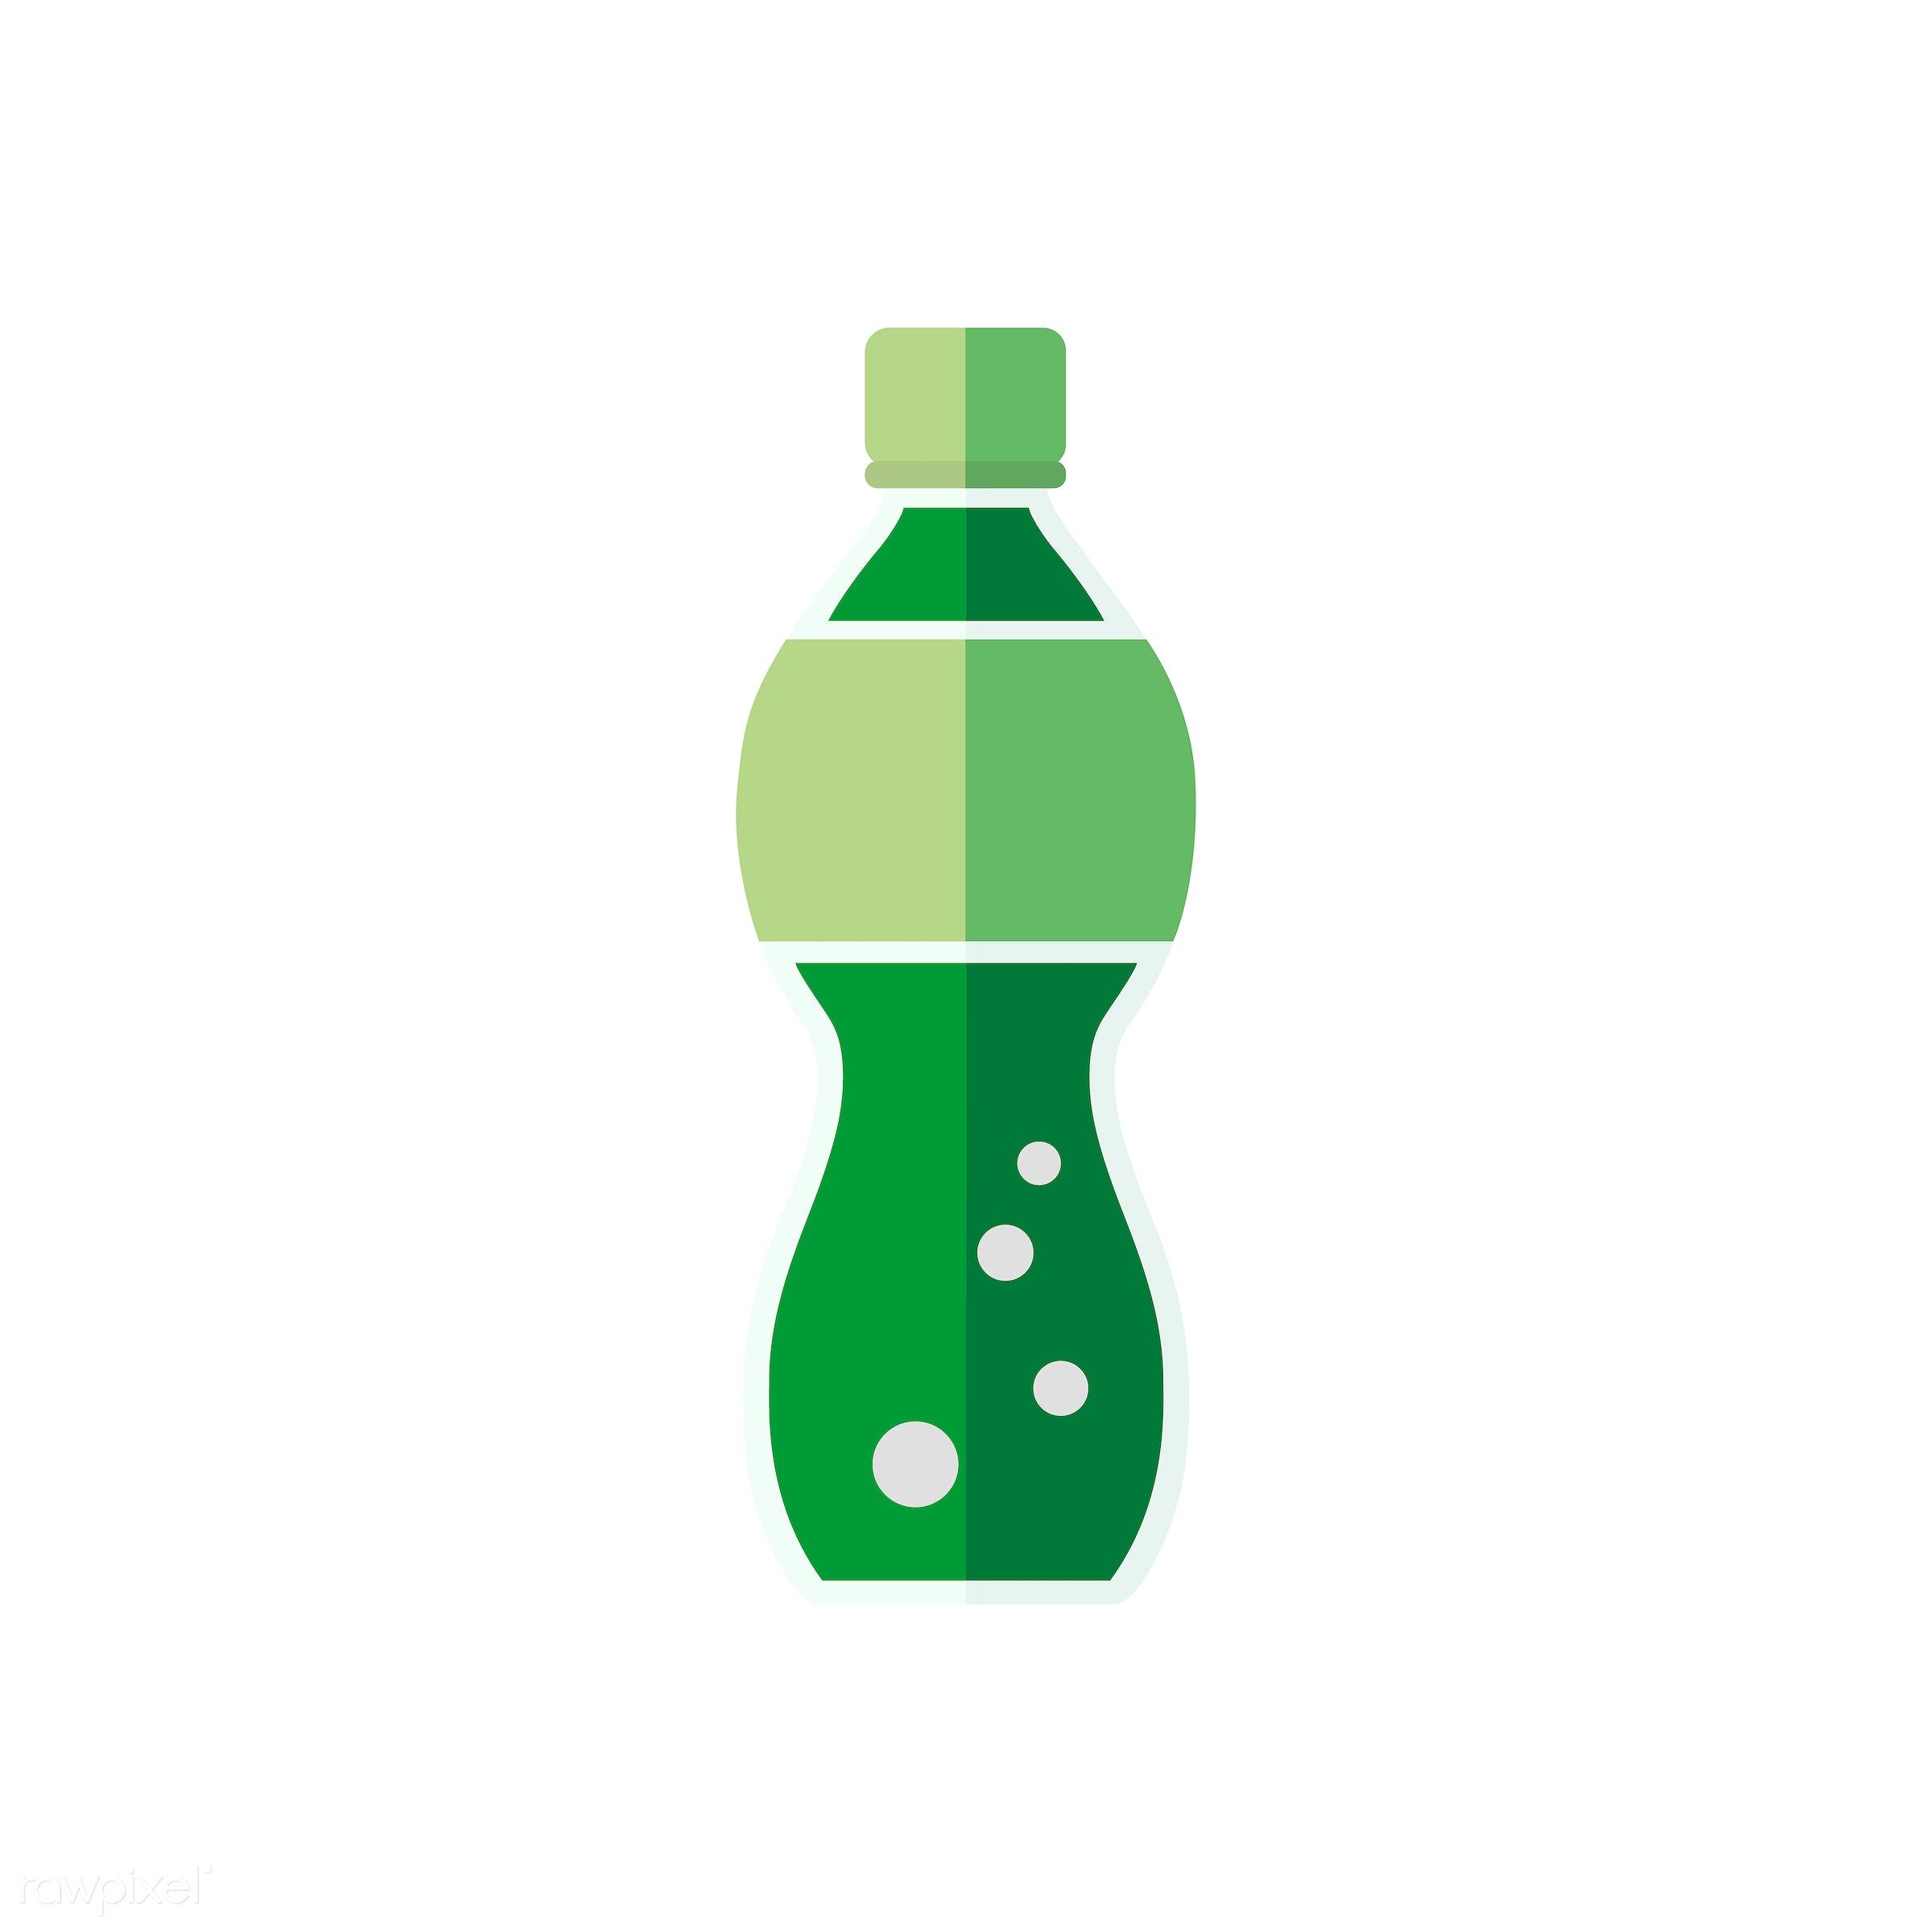 Soda bottle vector - vector, graphic, illustration, icon, symbol, colorful, cute, drink, beverage, water, soda, bottle, soda...